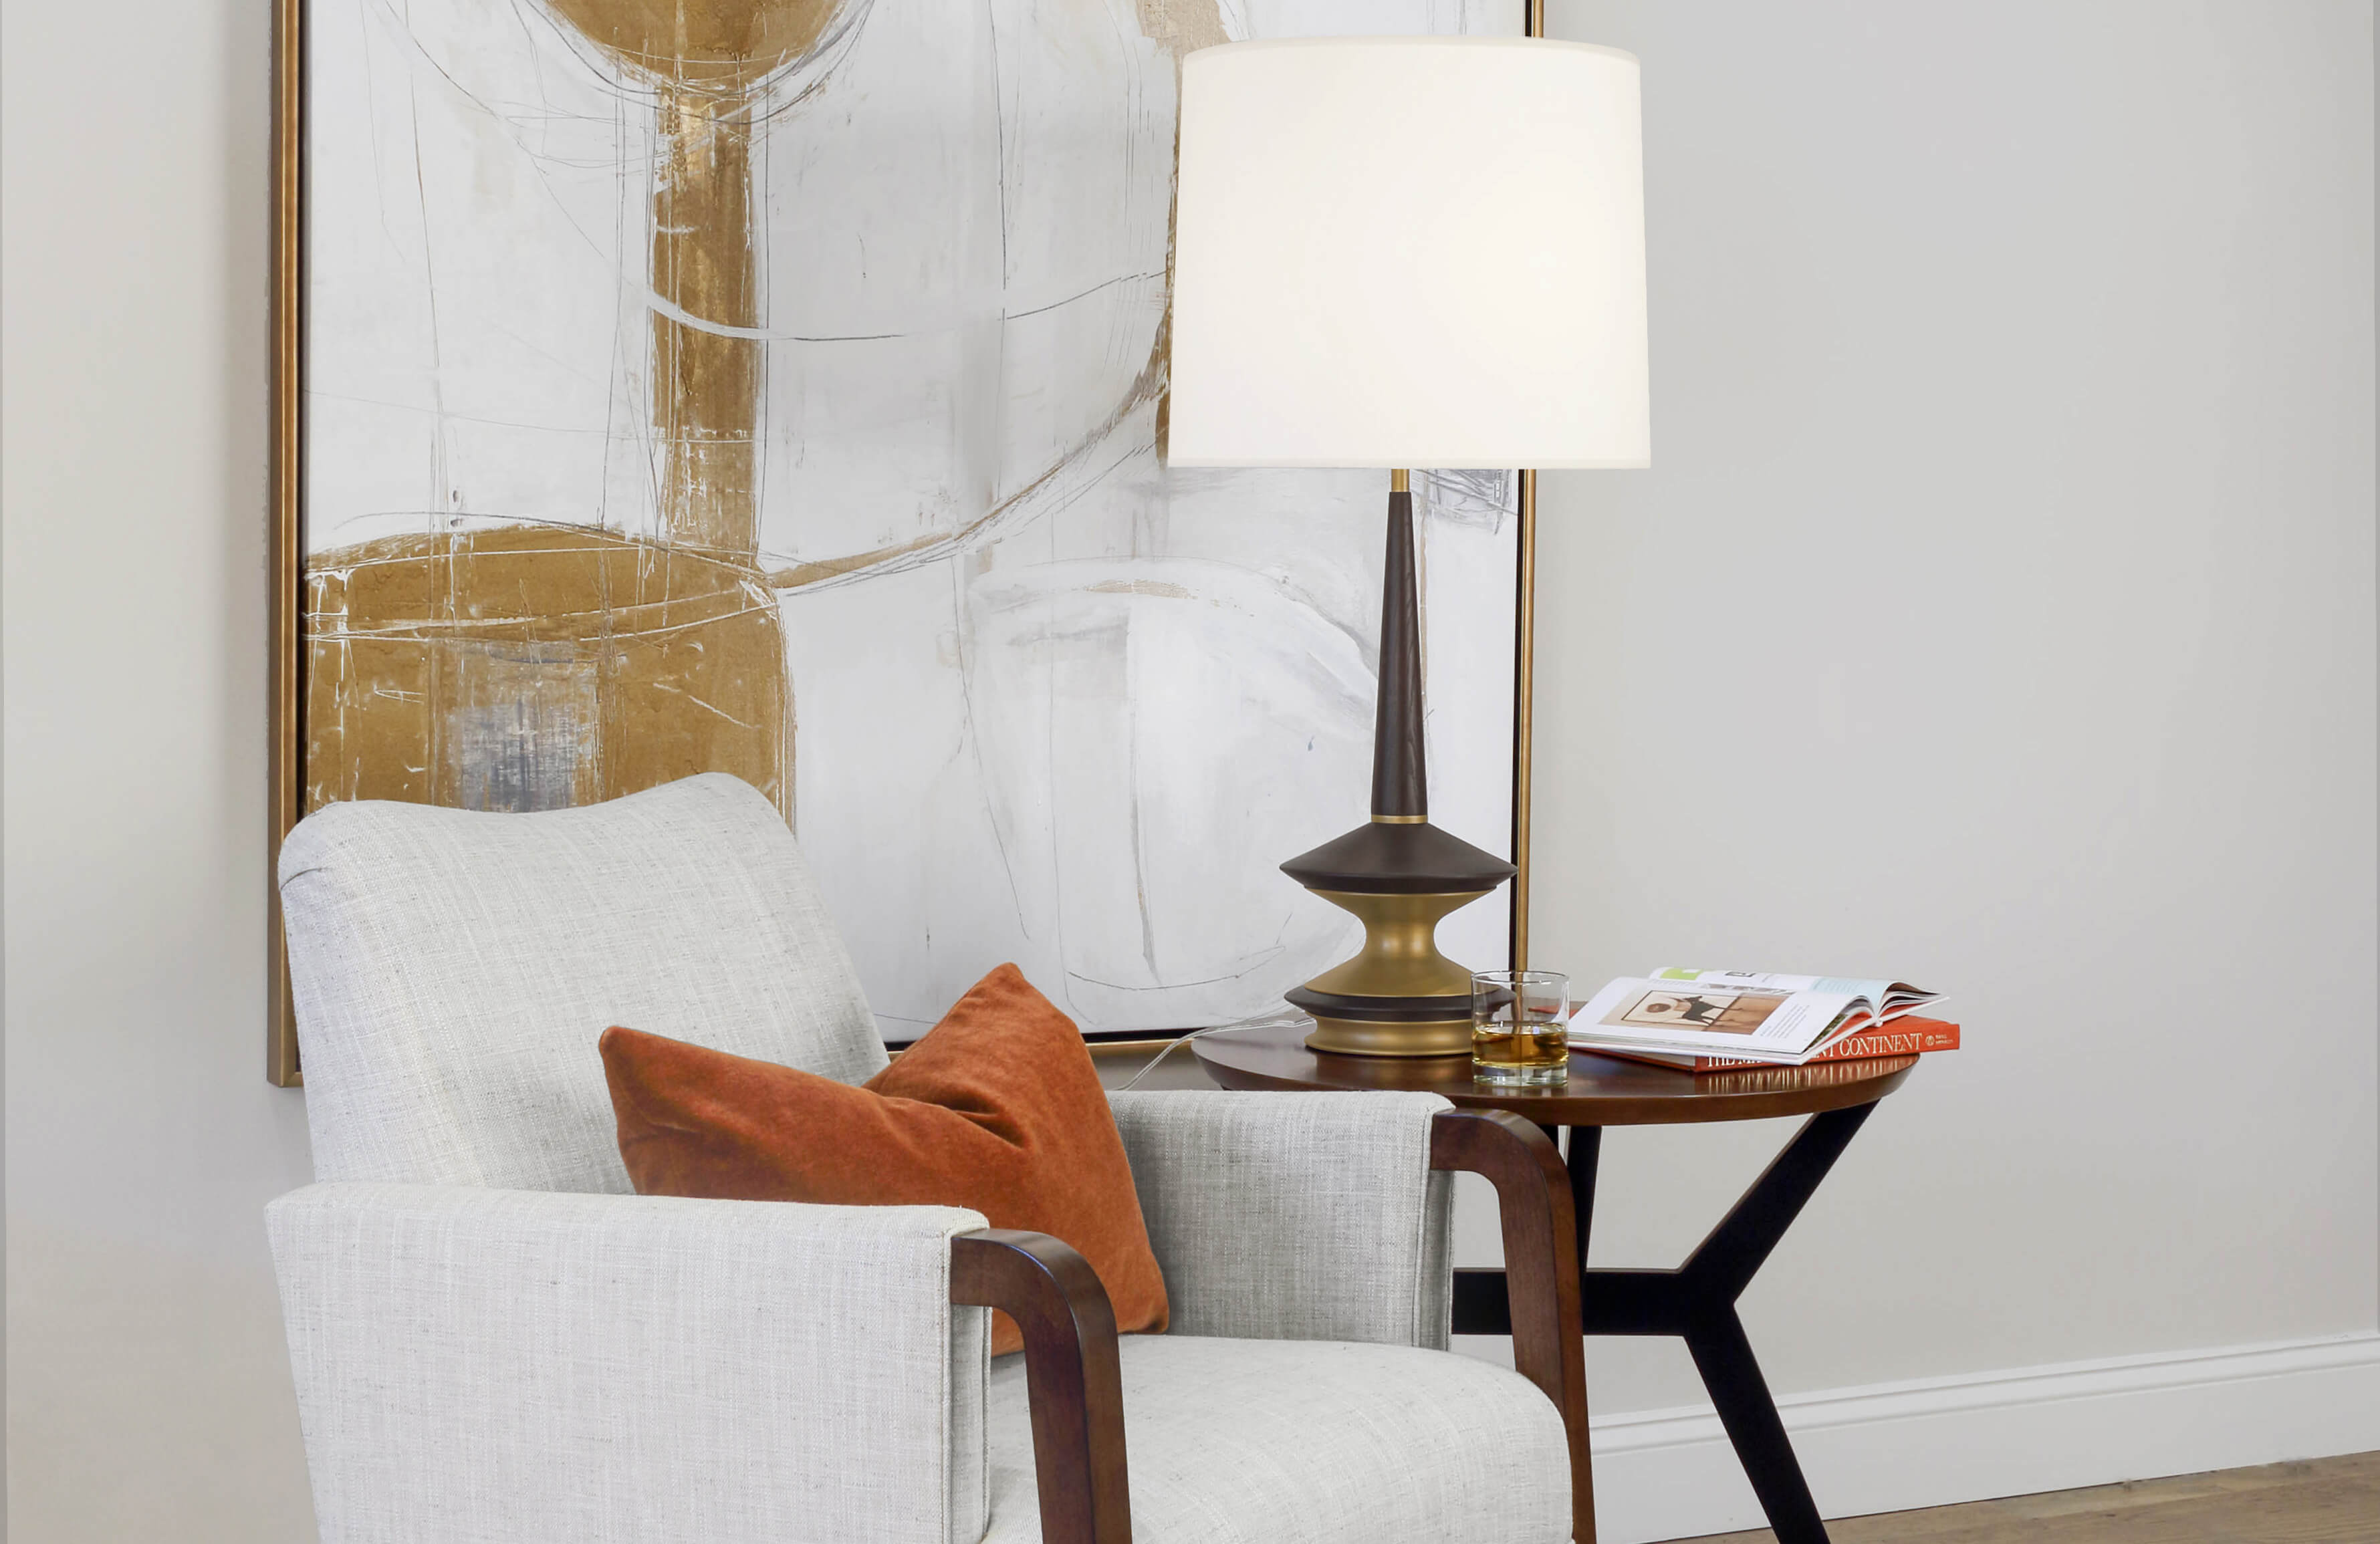 FLETCHER TABLE LAMP by Robert Abbey